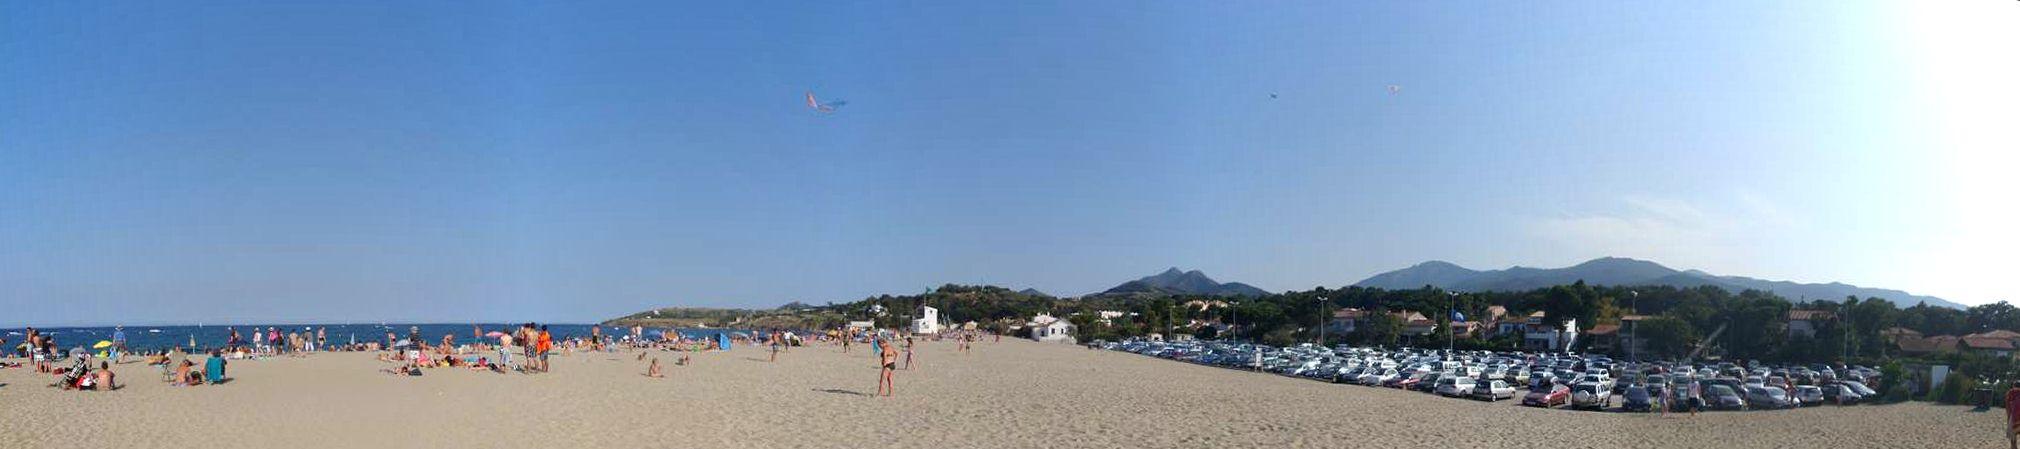 Strand bij Argelès-sur-Mer